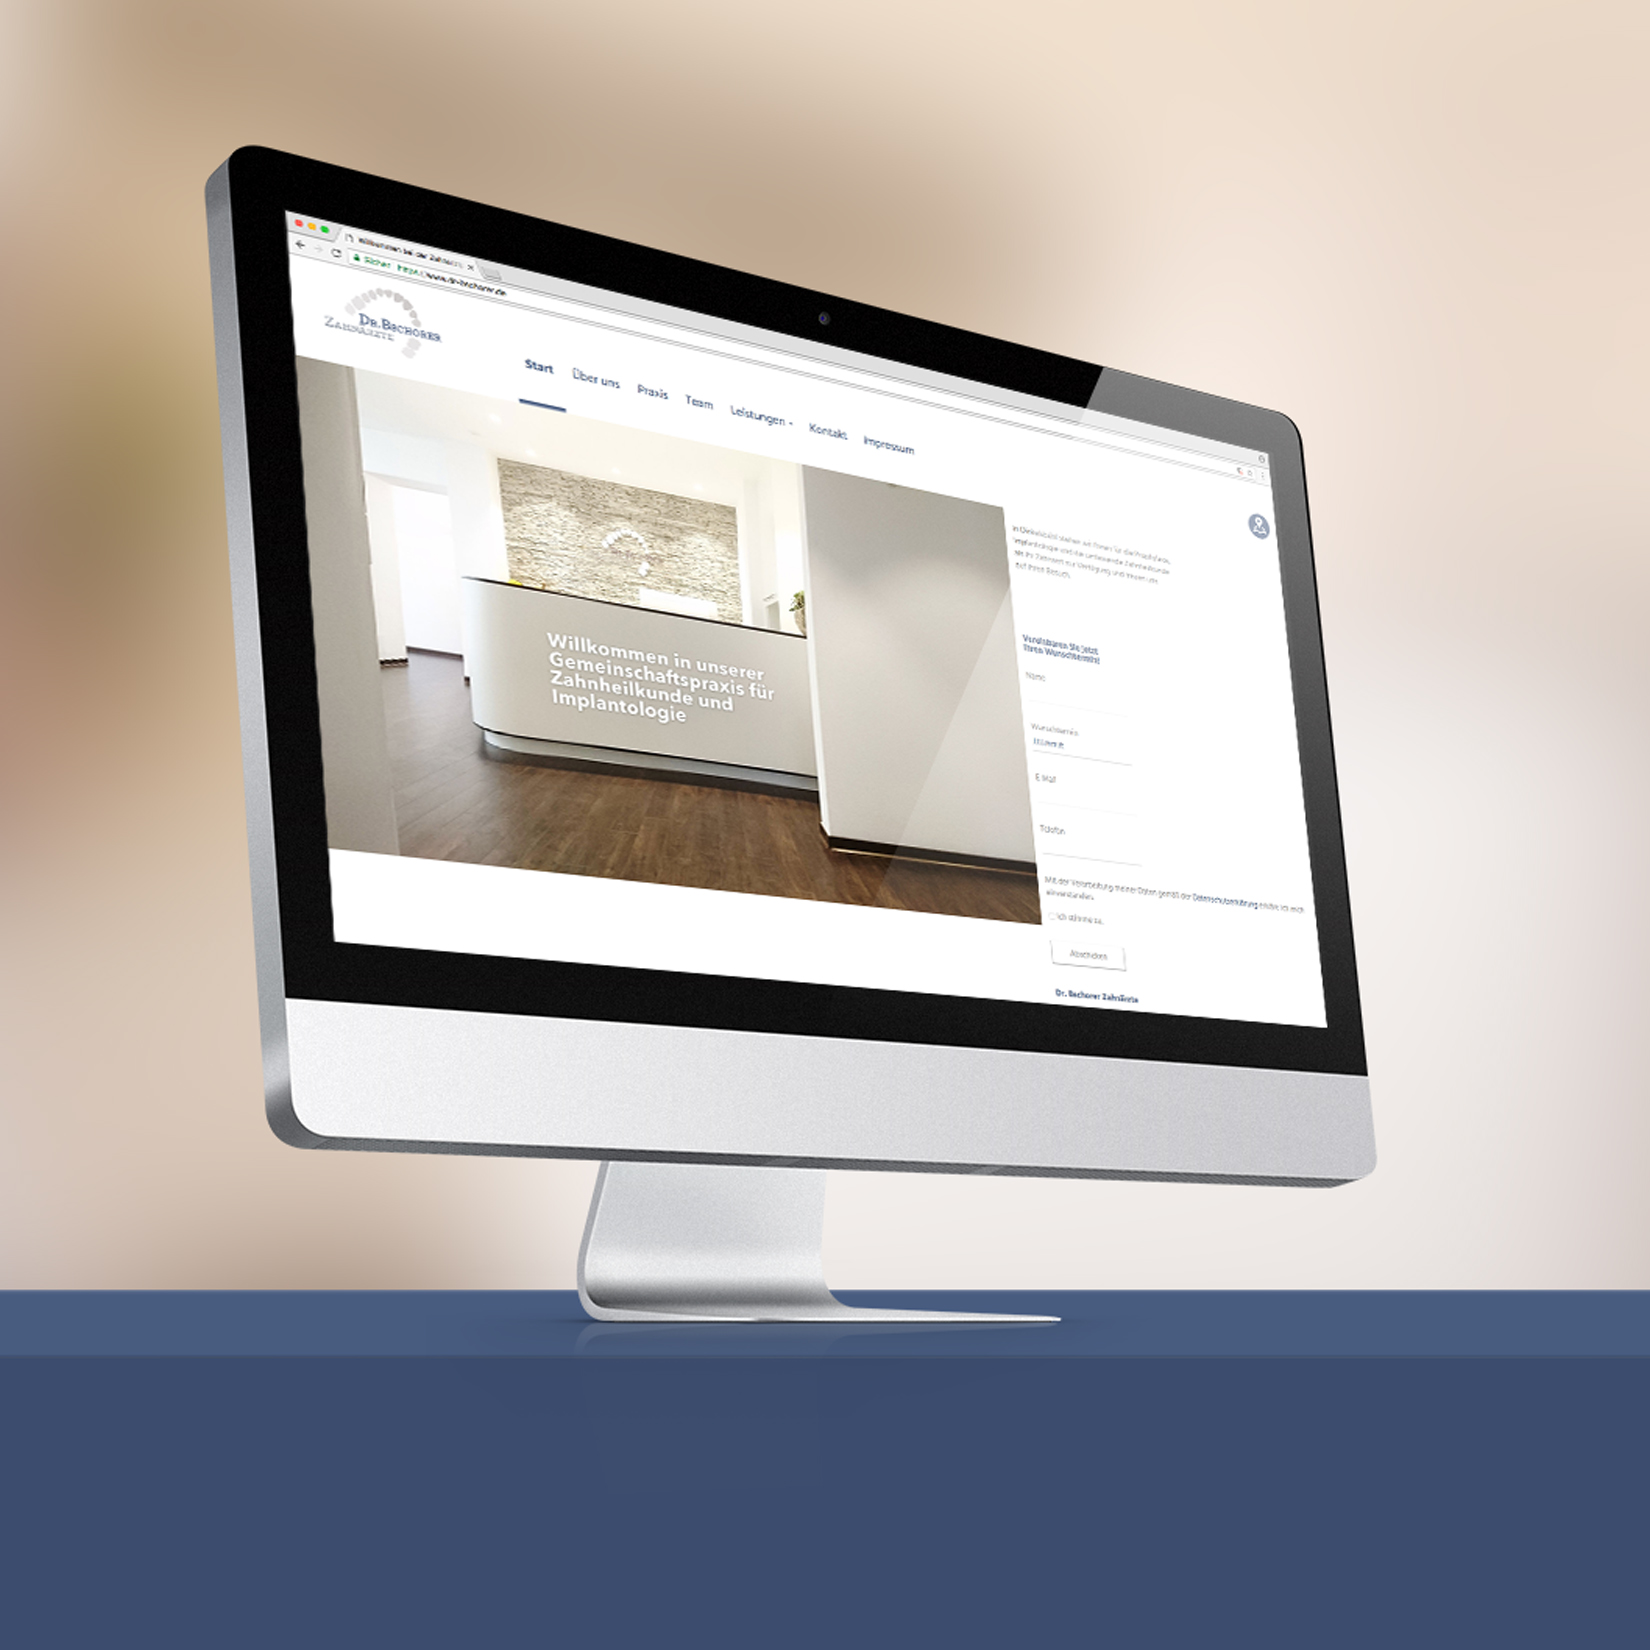 Zahnarztpraxis Dr. Bschorer Webdesign Mockup jos büro für Gestaltung Designbüro Würzburg